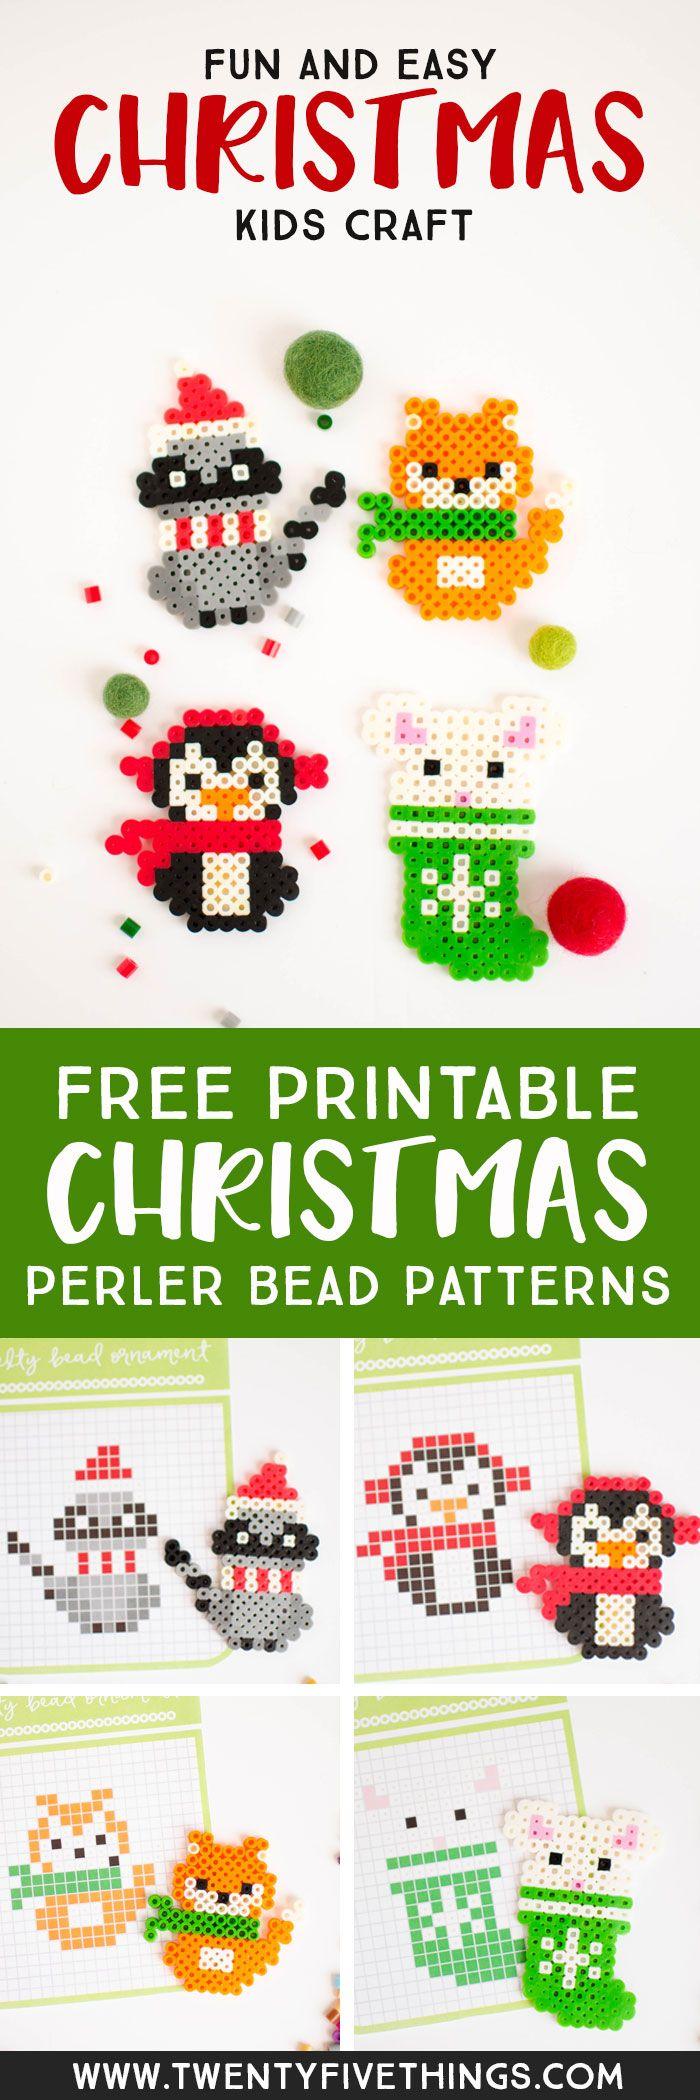 Christmas Perler Bead Patterns - Fun Loving Families